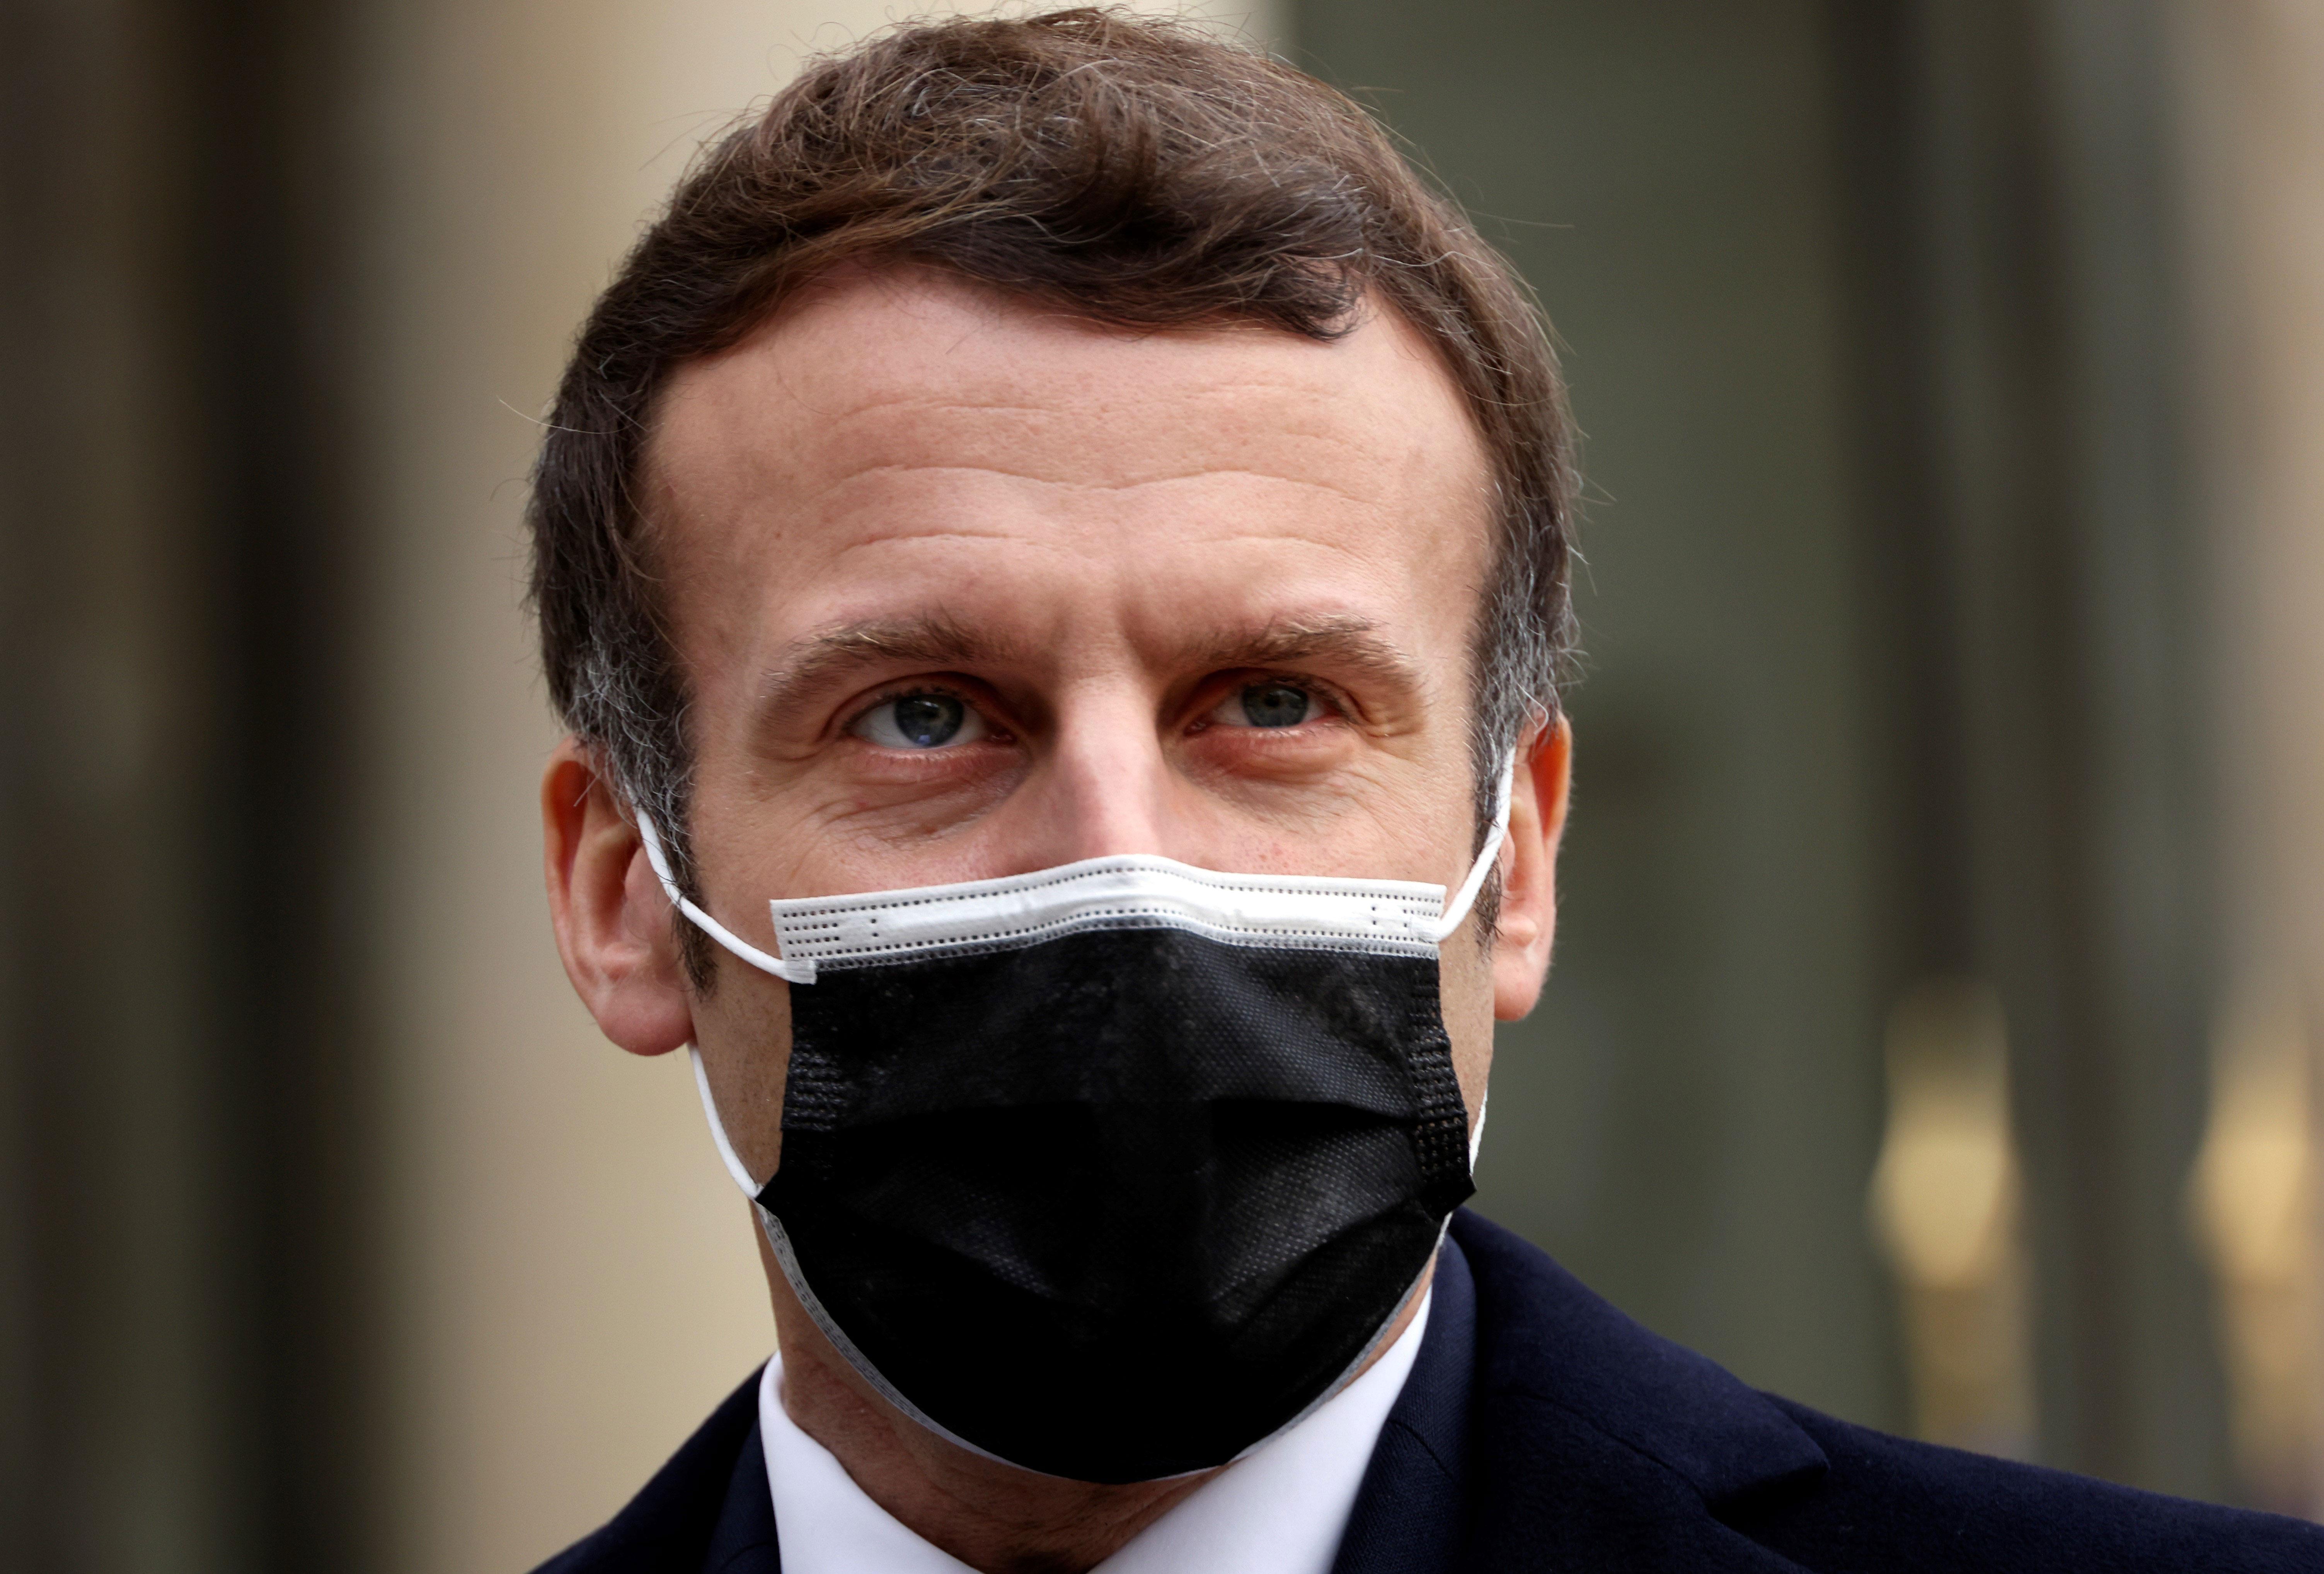 French President Emmanuel Macron speaks to the press in Paris on December 16.